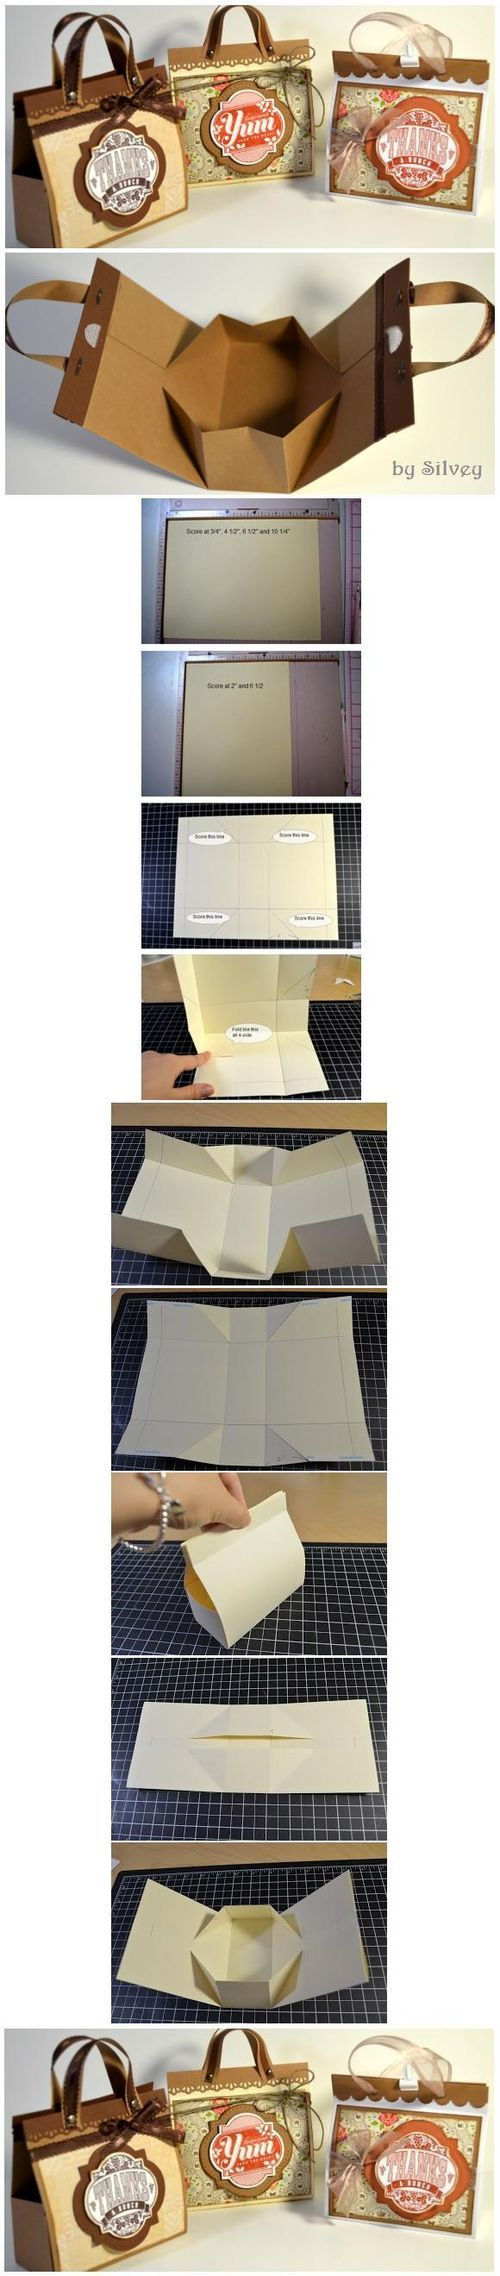 DIY Mini Paper Handbag DIY Projects / UsefulDIY.com on imgfave